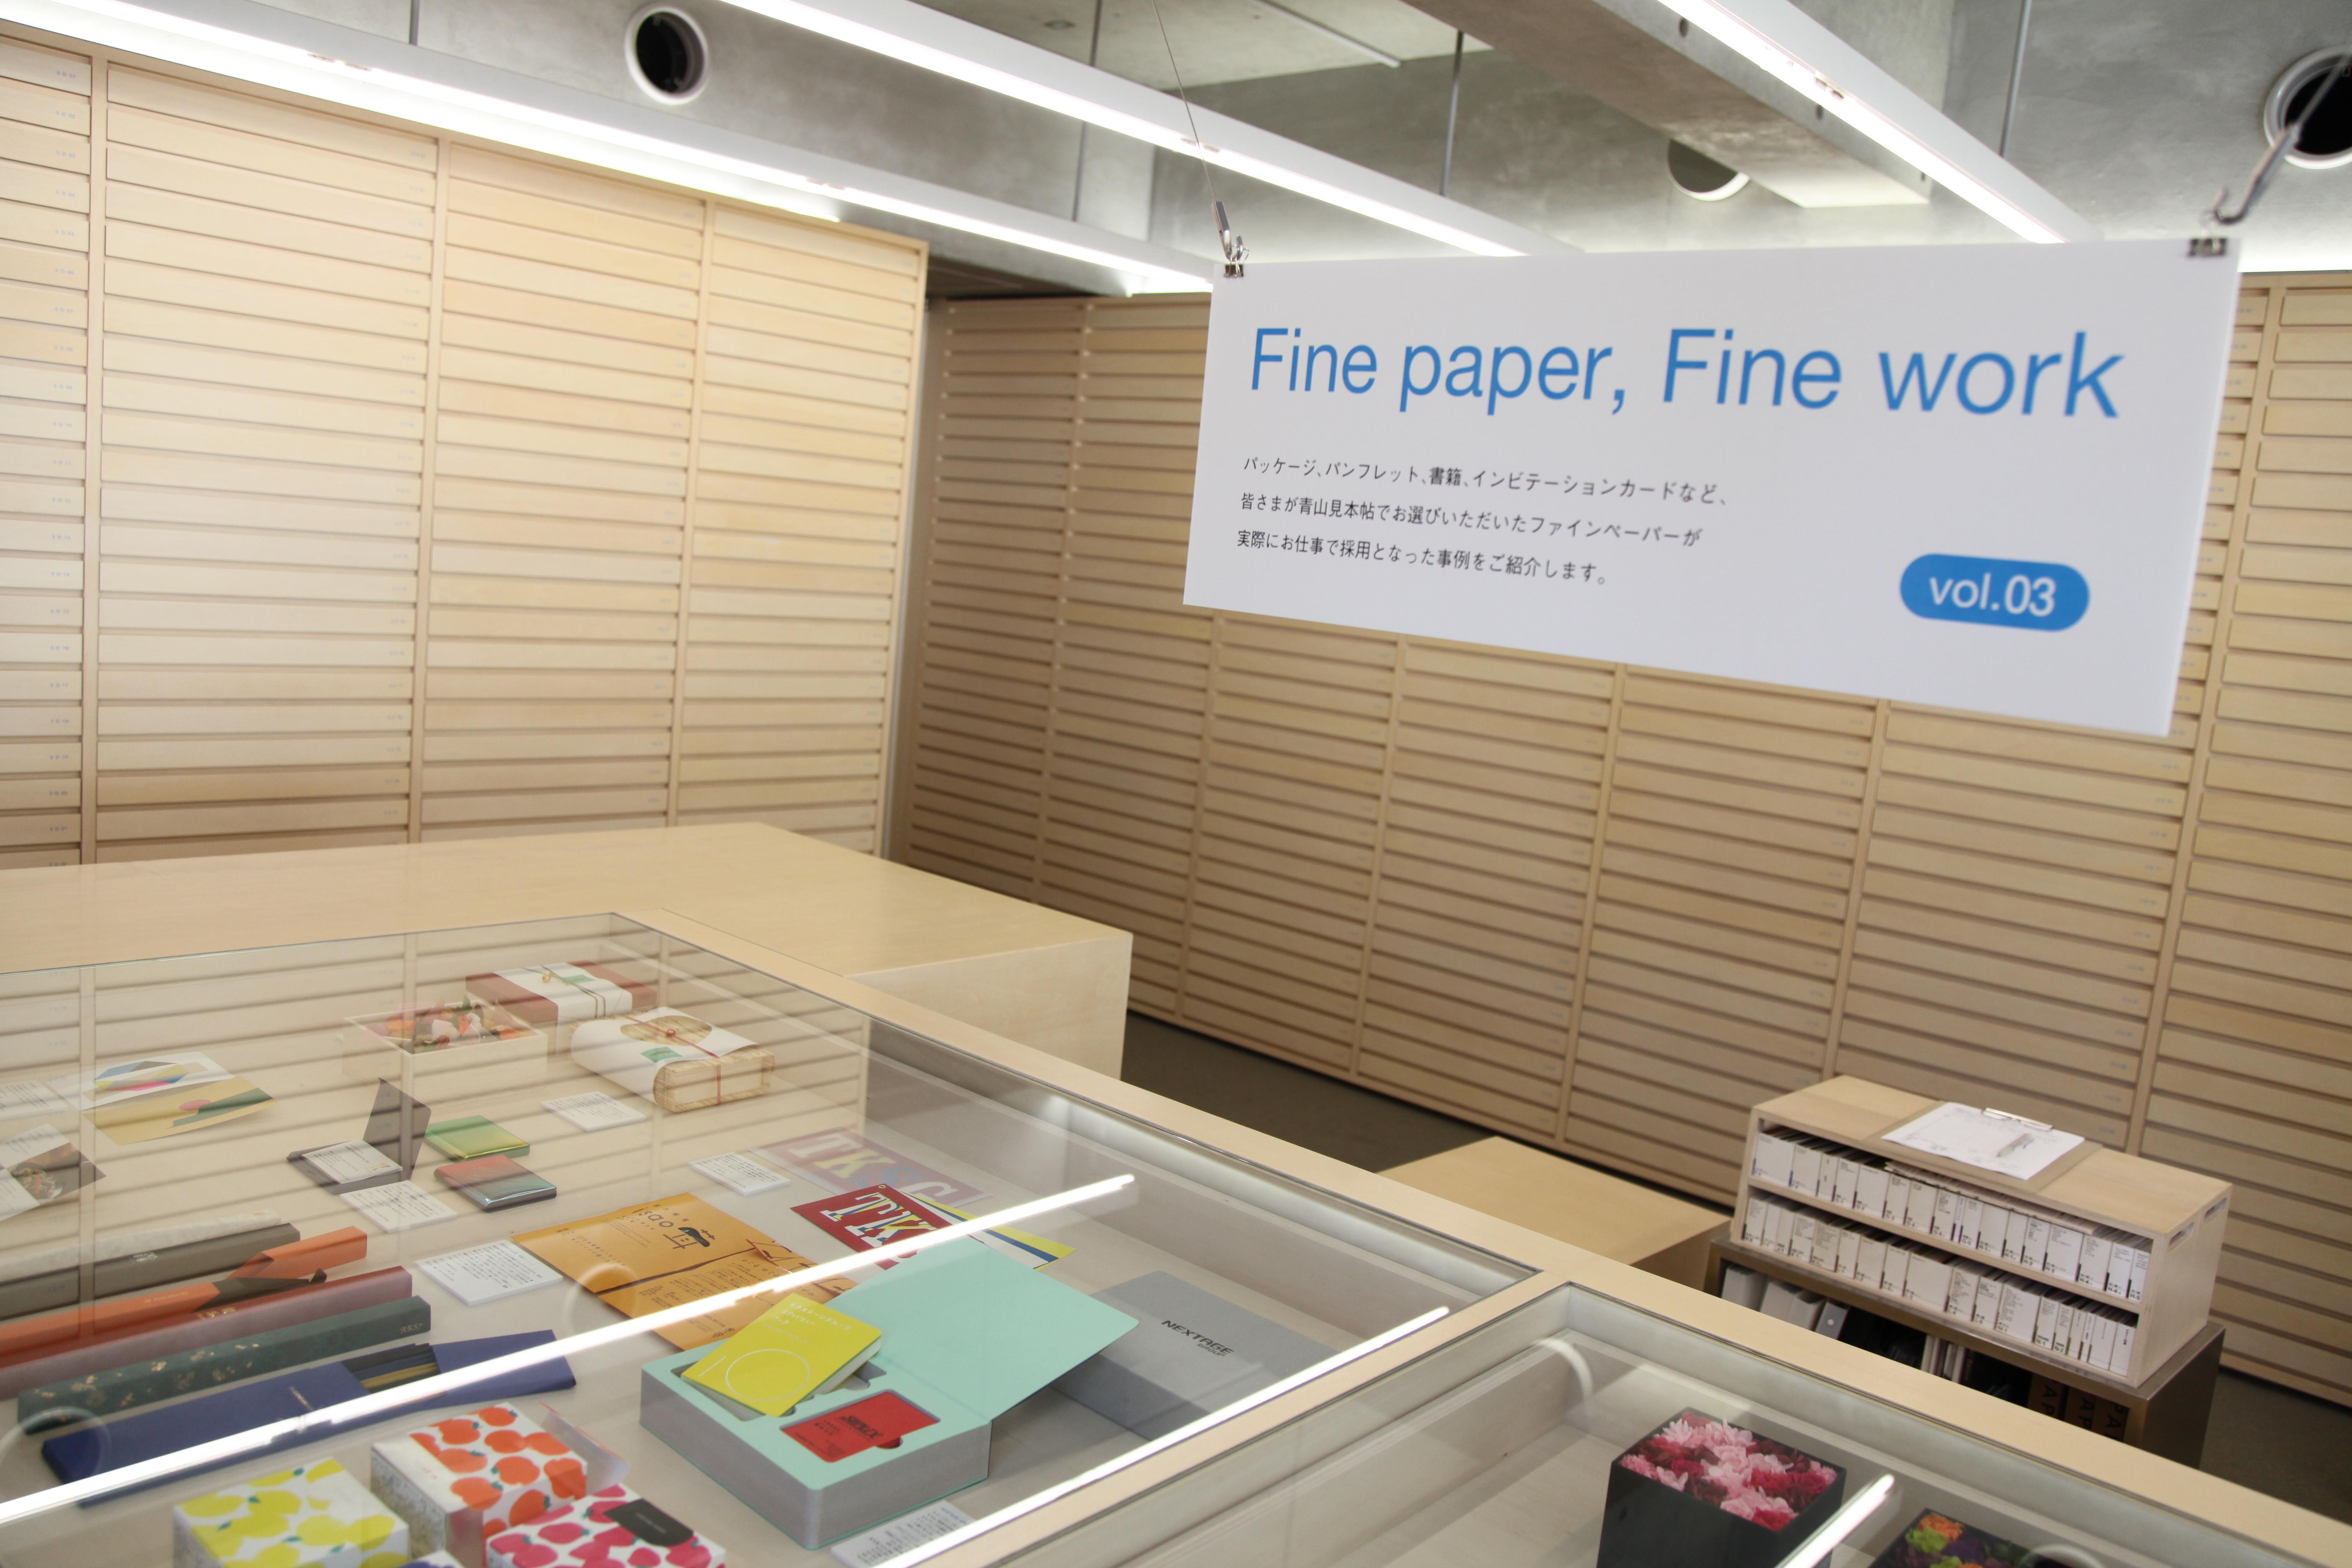 ▲「Fine paper, Fine work展vol.03」展示の様子。ショーケースの中に様々な製品が並べられています。